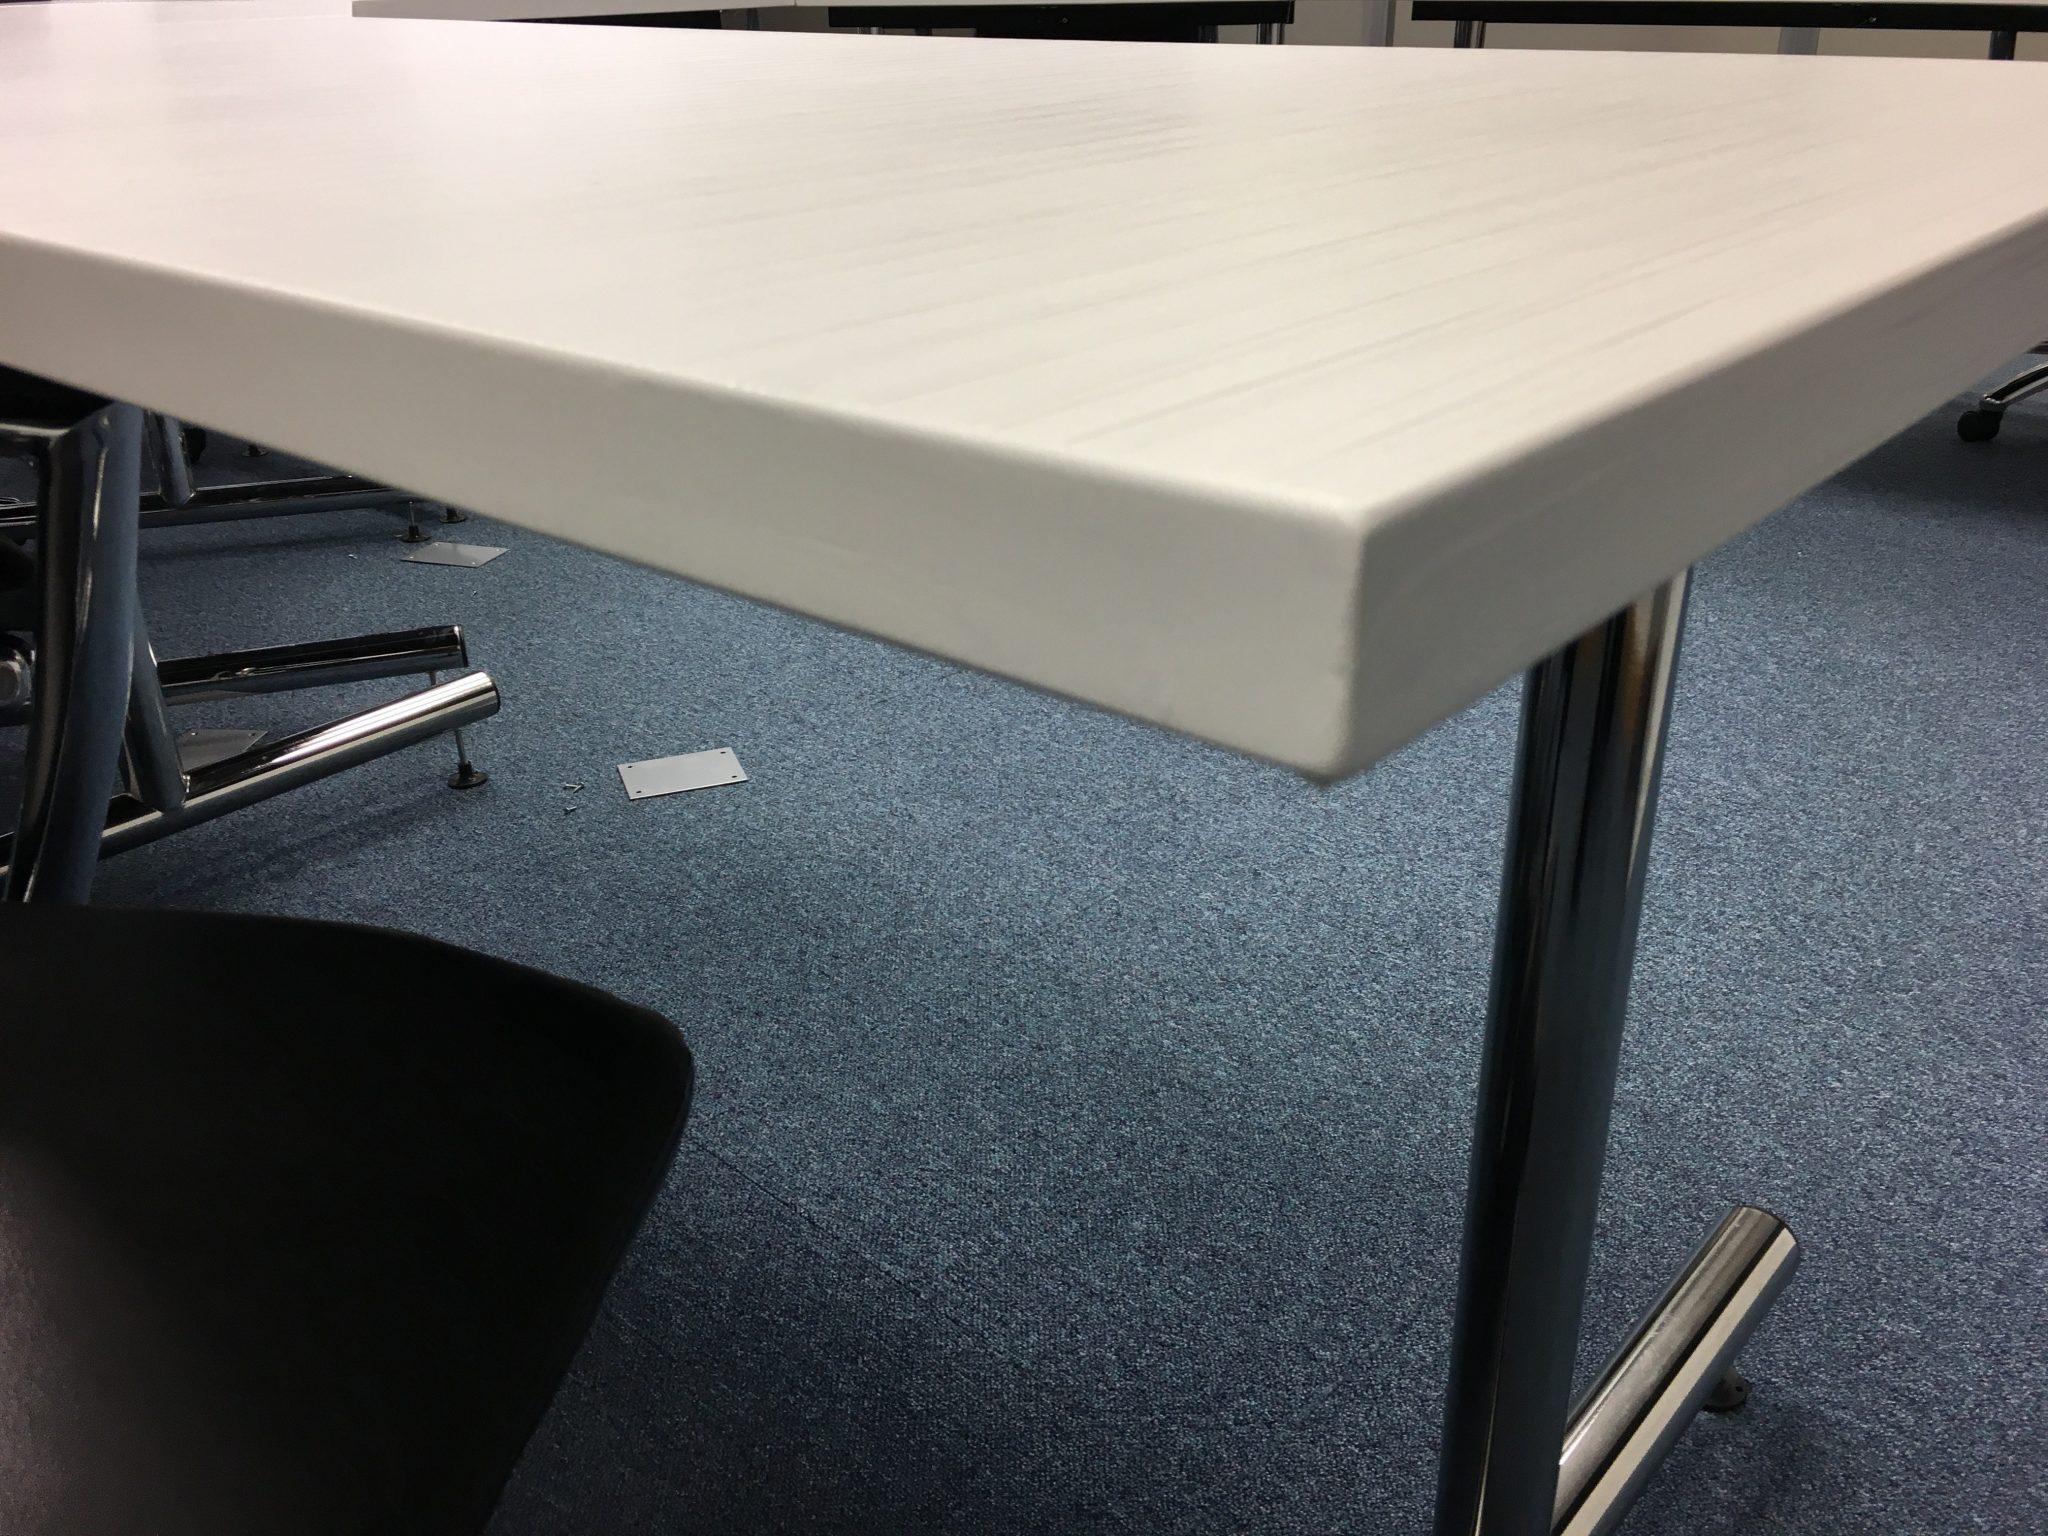 Table corner vinyl wrapped